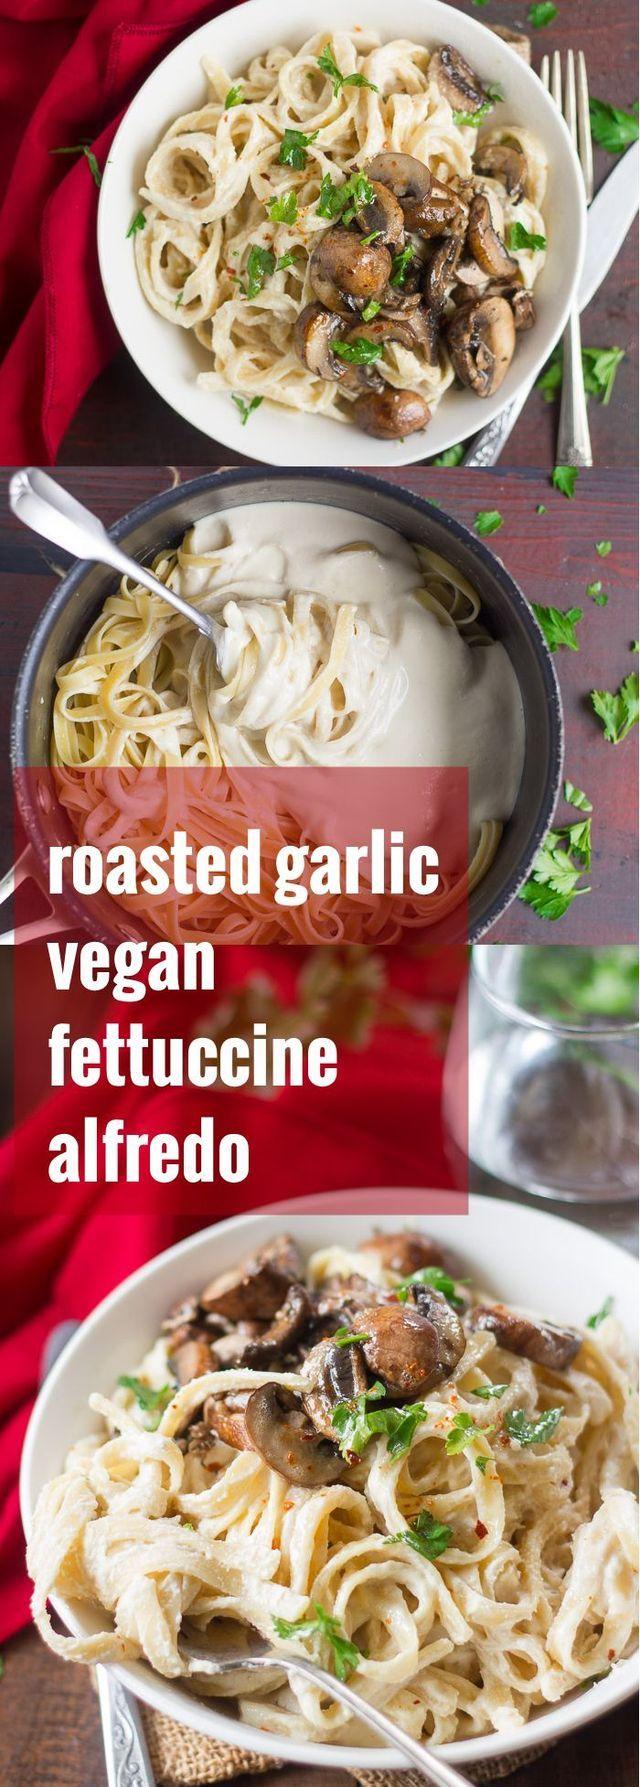 Roasted Garlic Baby Portobello Vegan Fettuccine Alfredo Connoisseurus Veg Recipe Vegan Fettuccine Alfredo Fettuccine Alfredo Vegan Alfredo